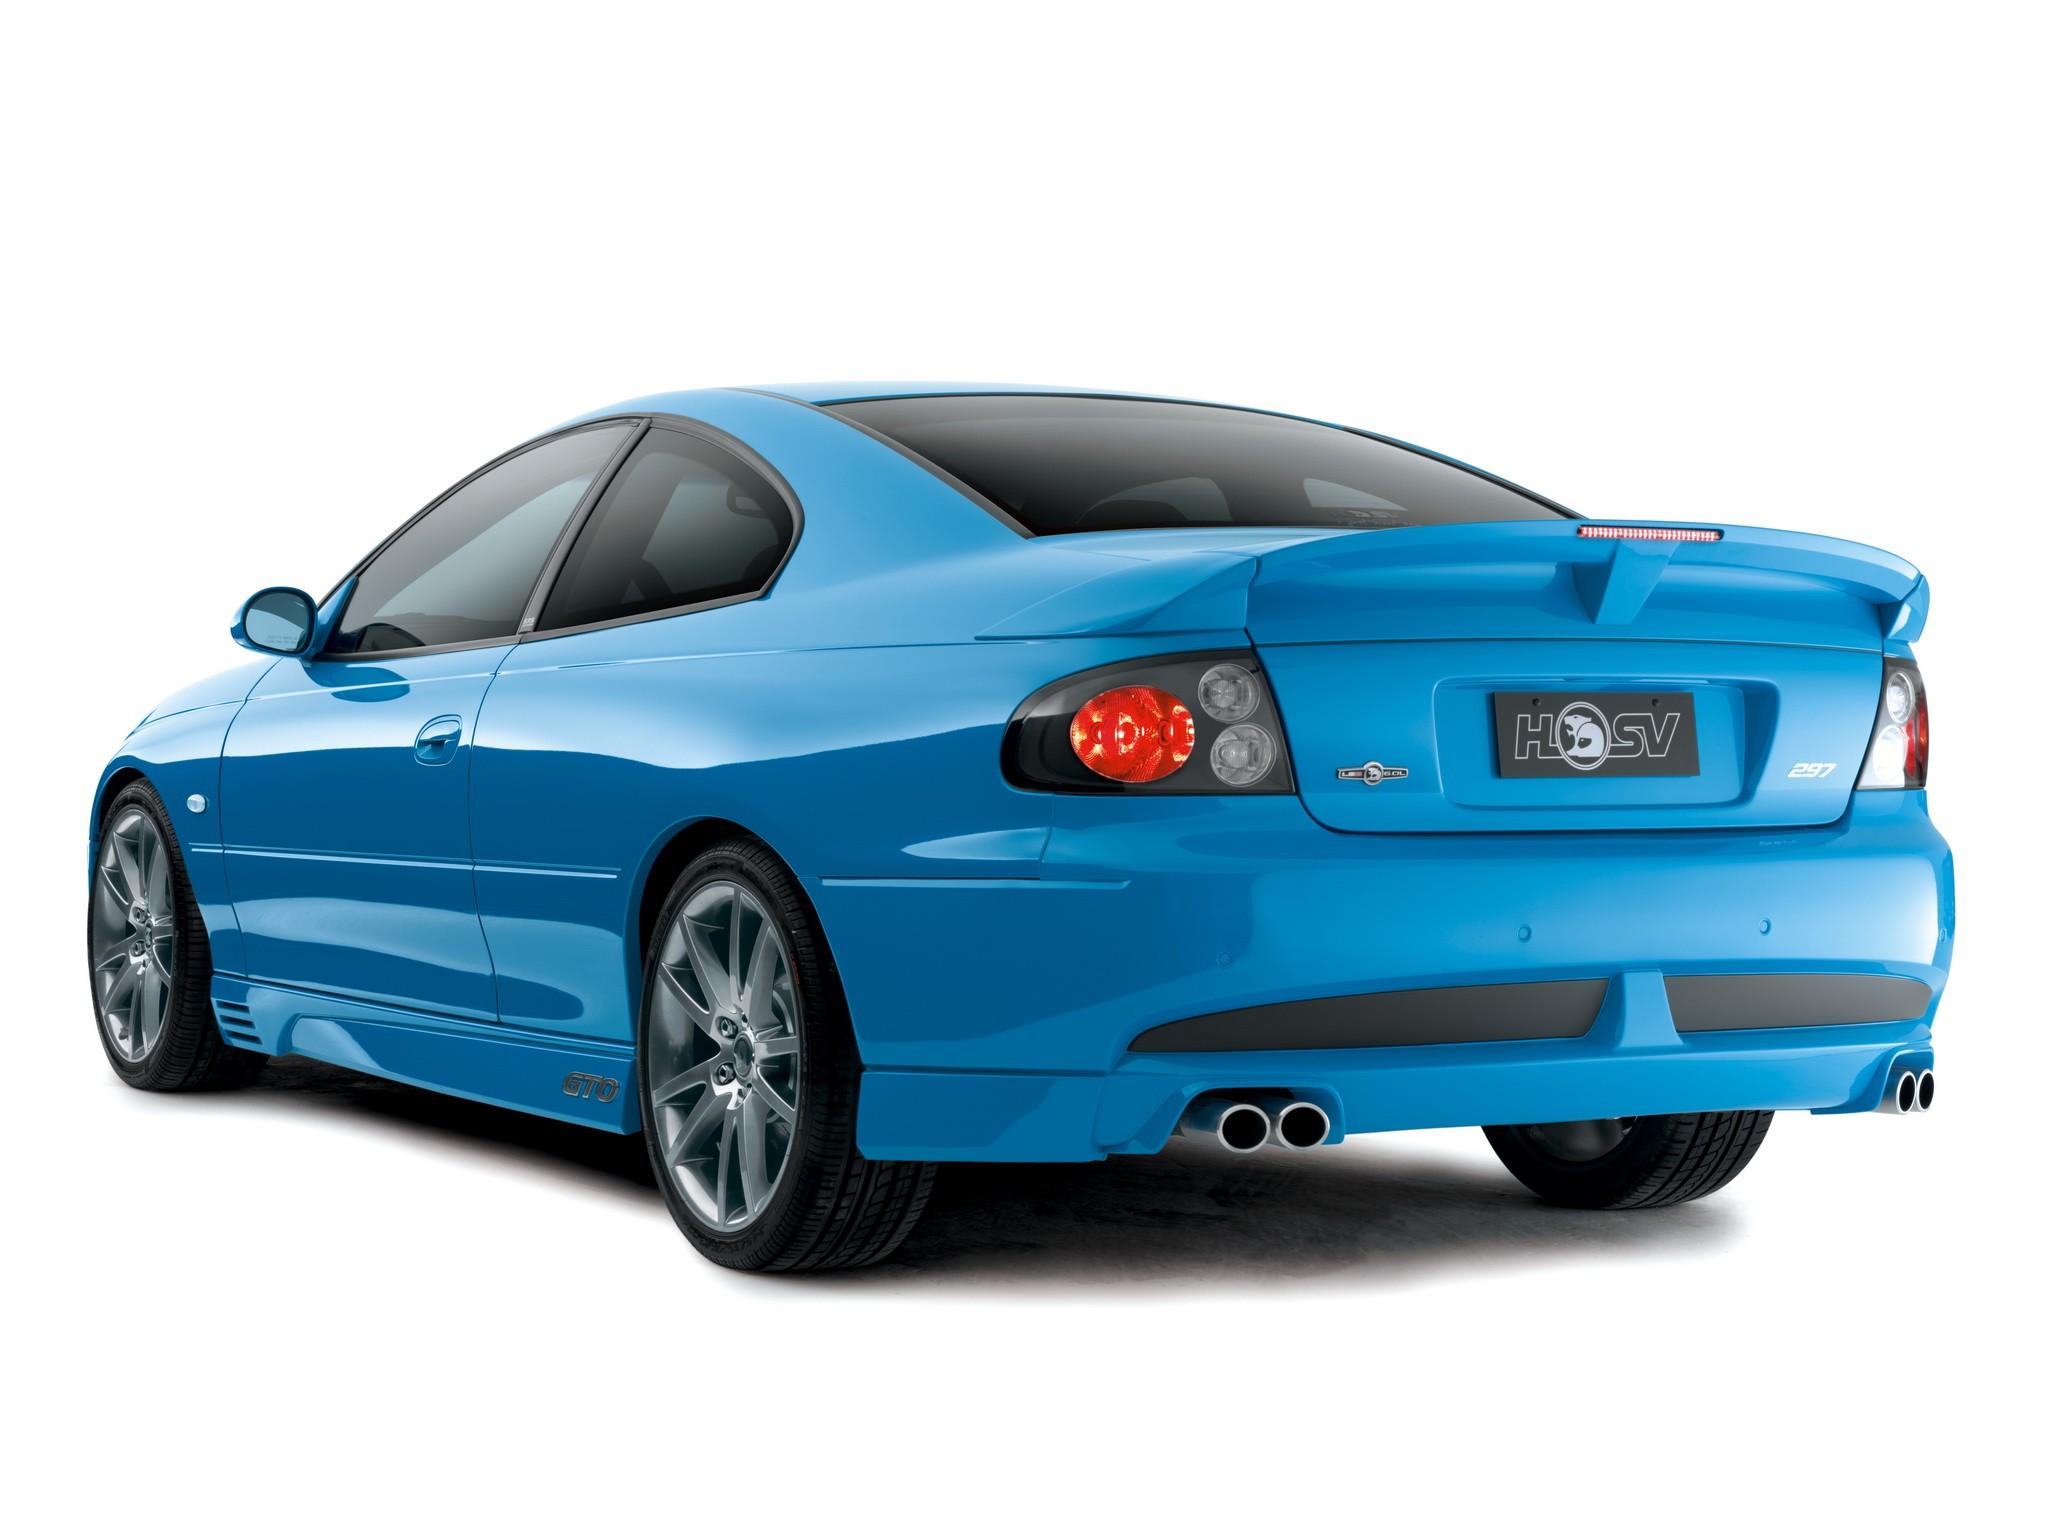 2003 HSV Coupe GTO